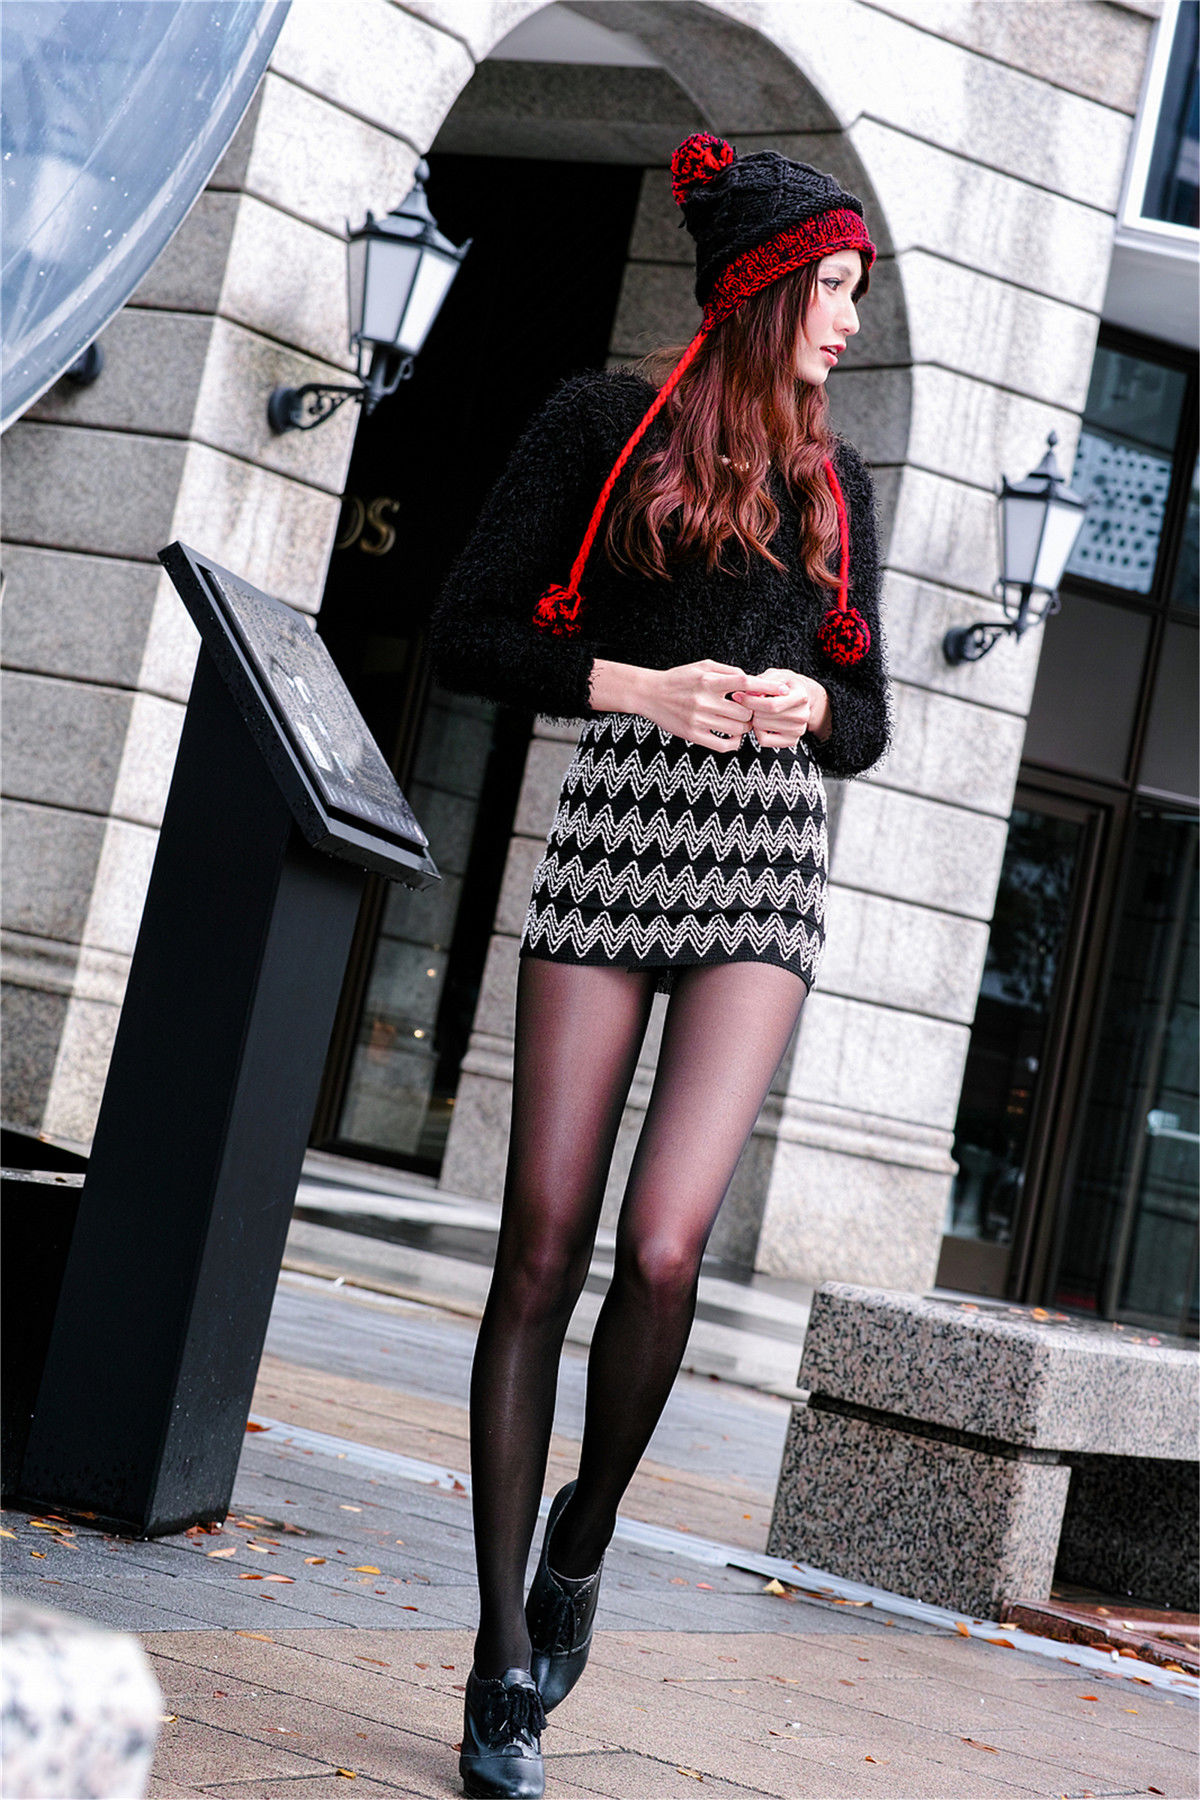 VOL.1401 [台湾正妹]丝袜美腿长腿美女街拍高跟:蔡译心(Candice)超高清个人性感漂亮大图(89P)